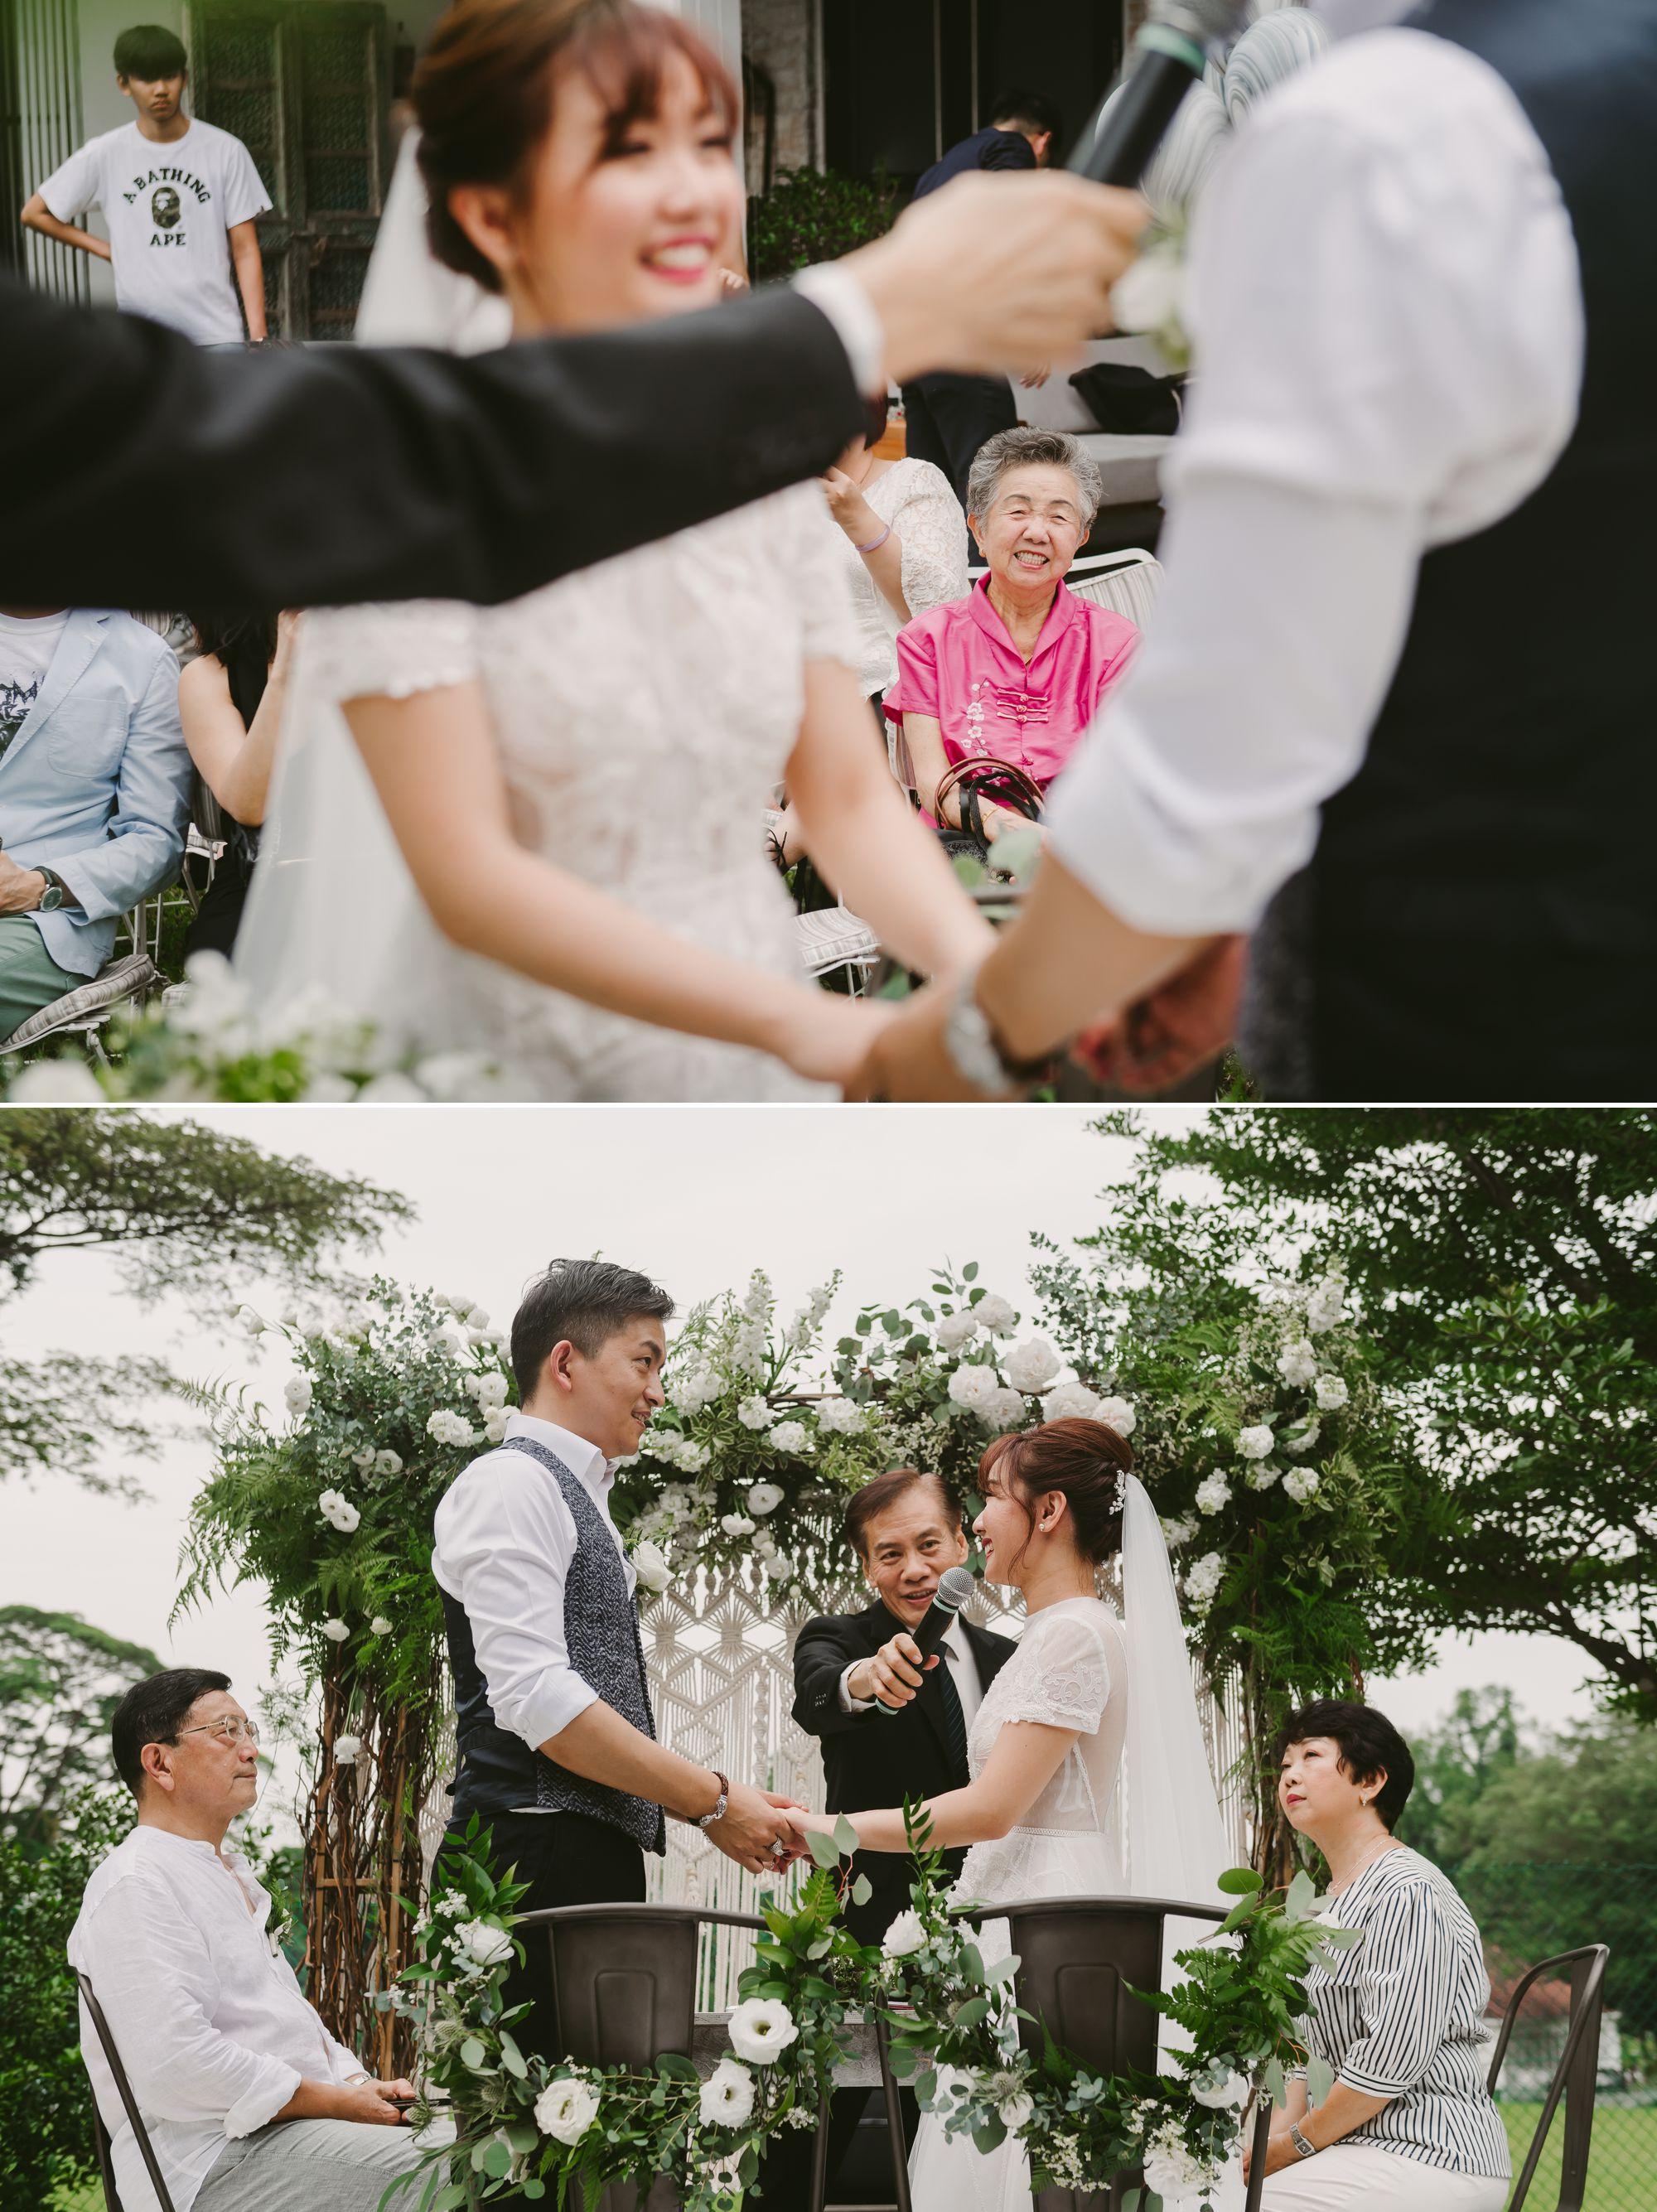 wedding_photography 18.jpg